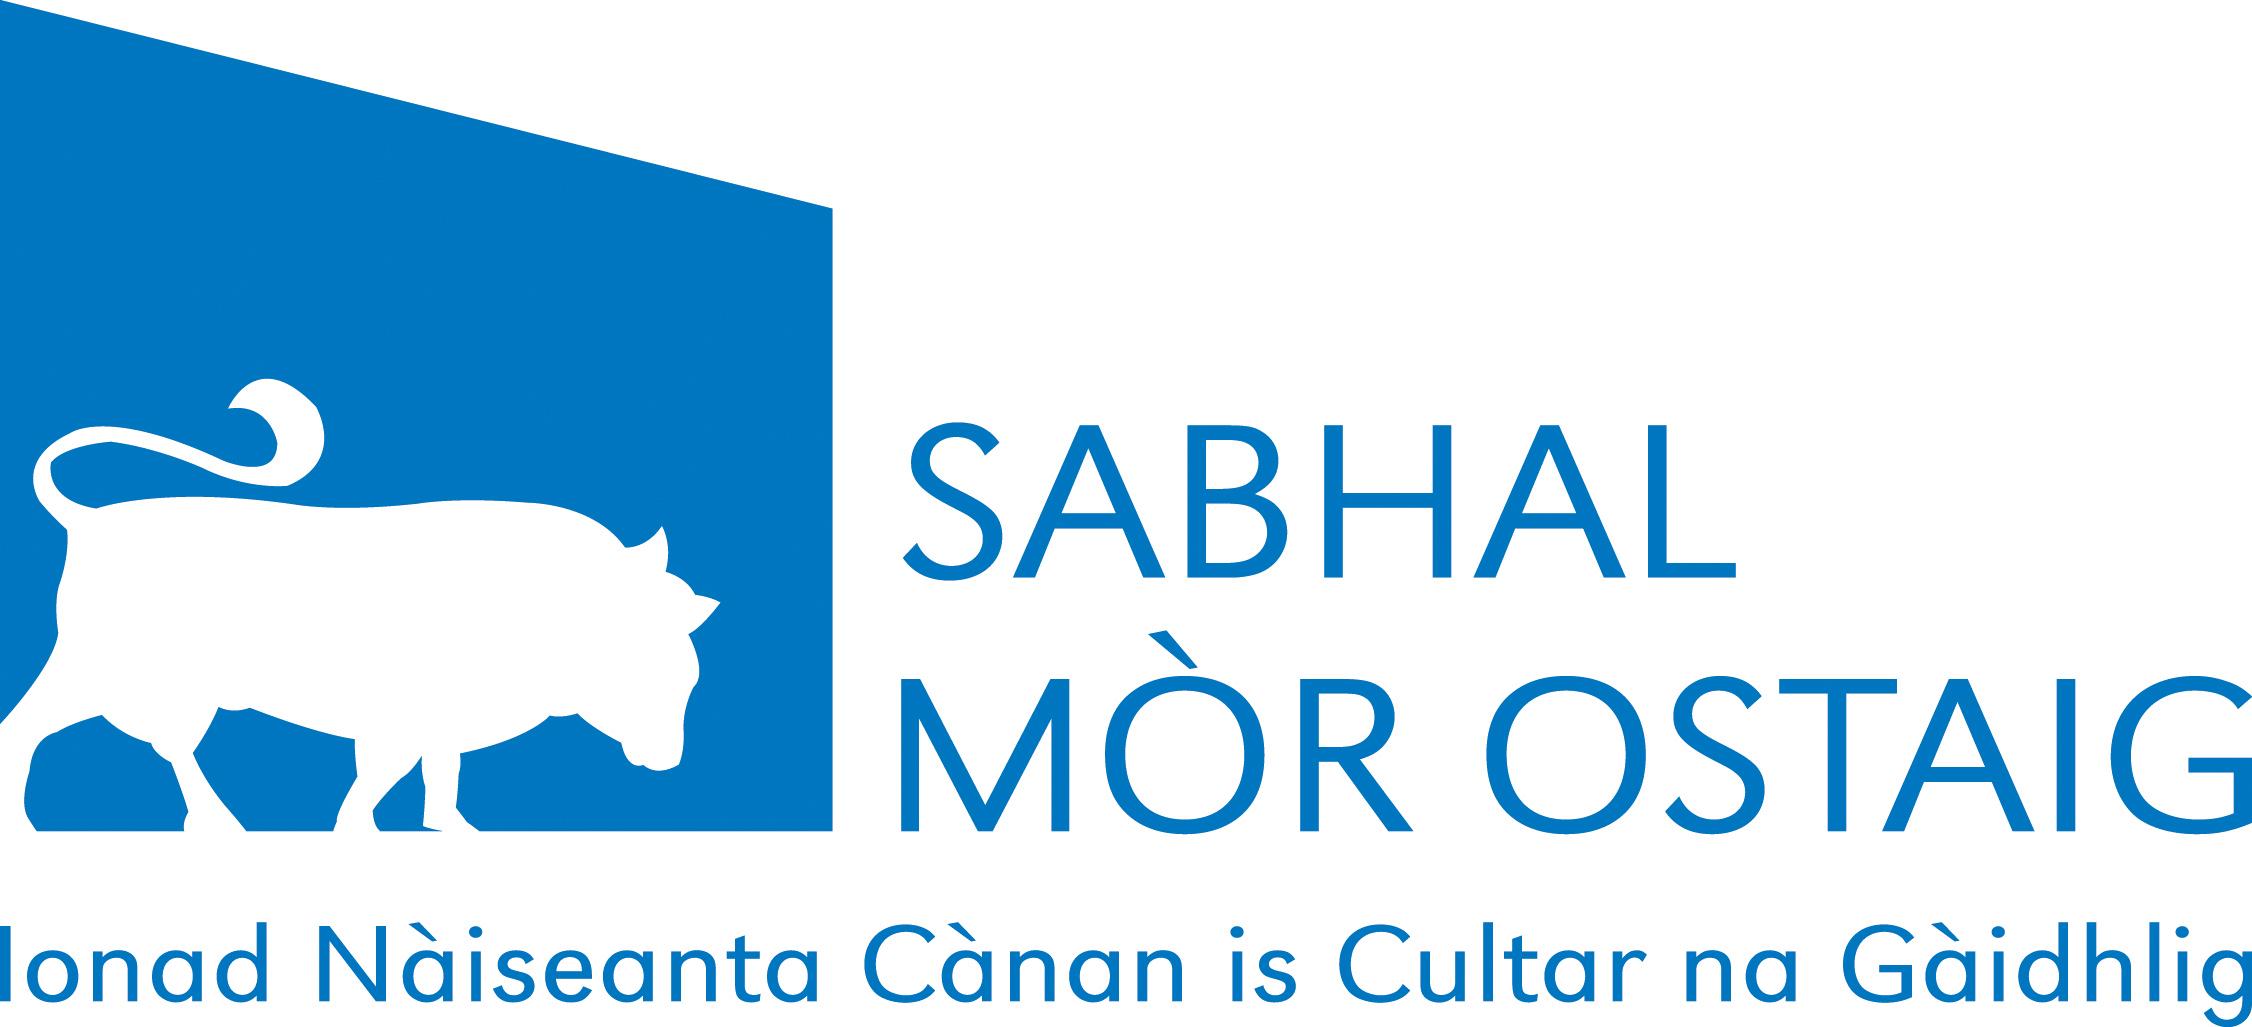 Sabhal Mor Ostaig logo